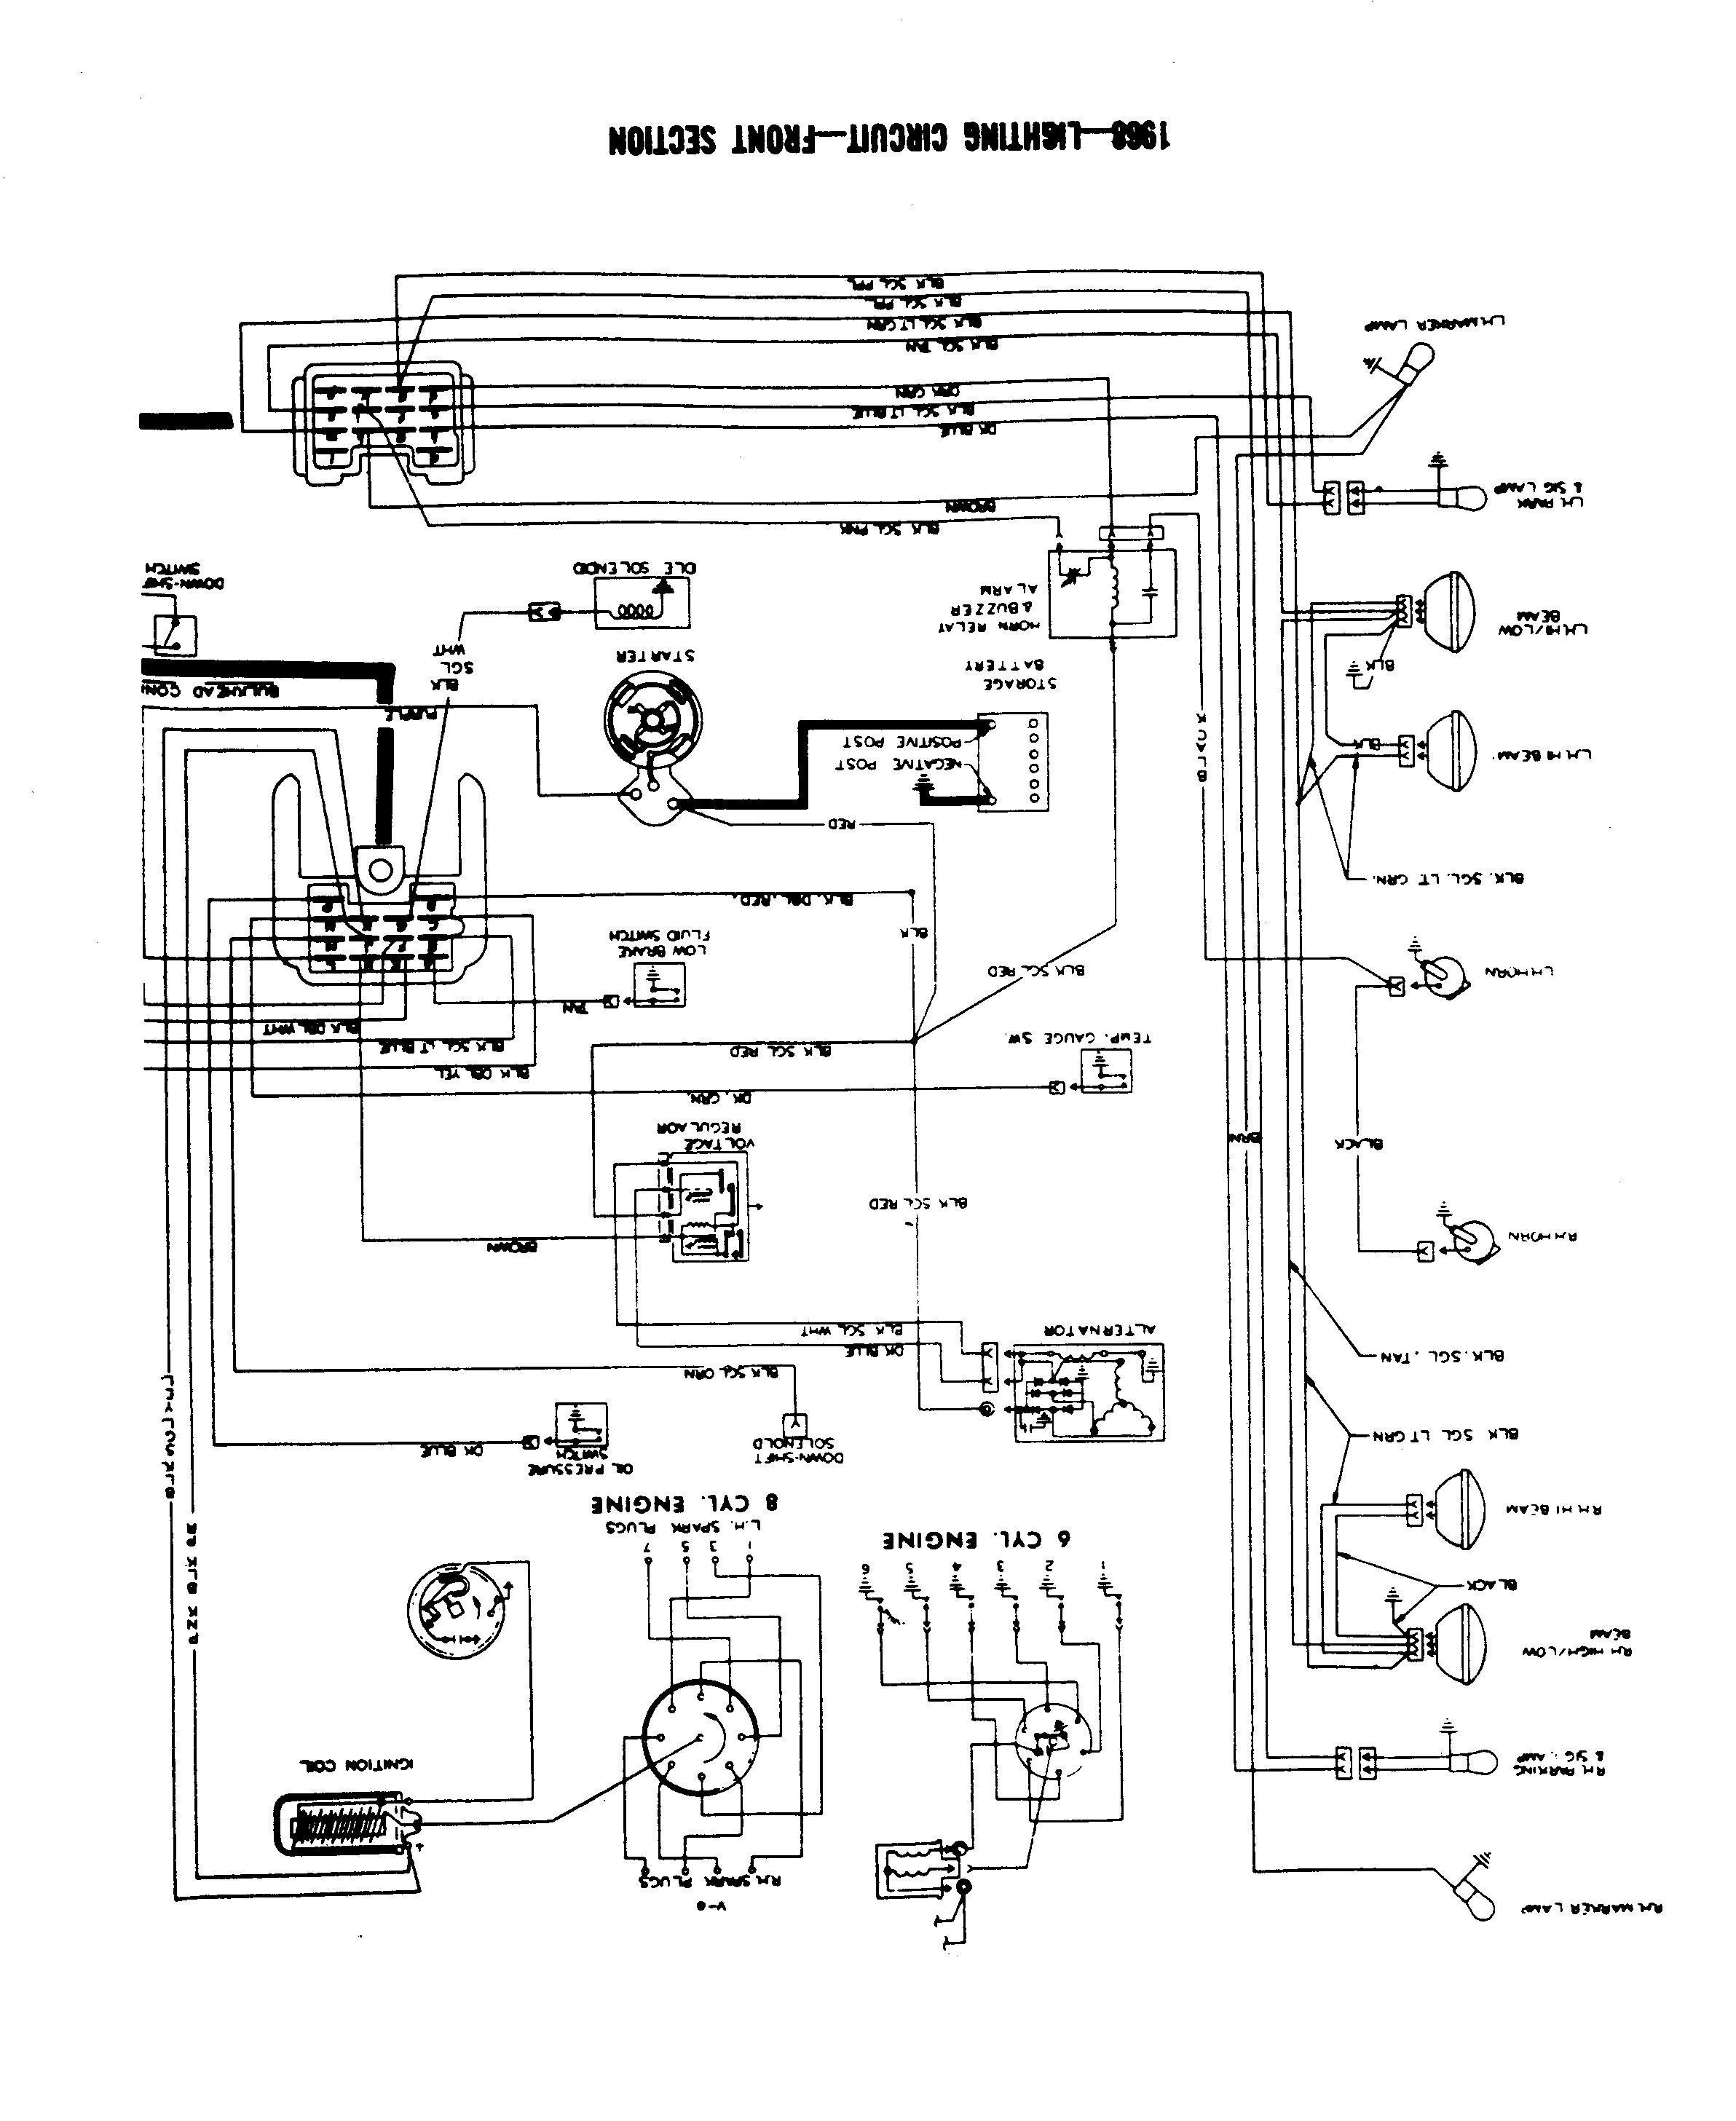 Gto Wiring Diagram Scans Page 2 Pontiac Gto Forum